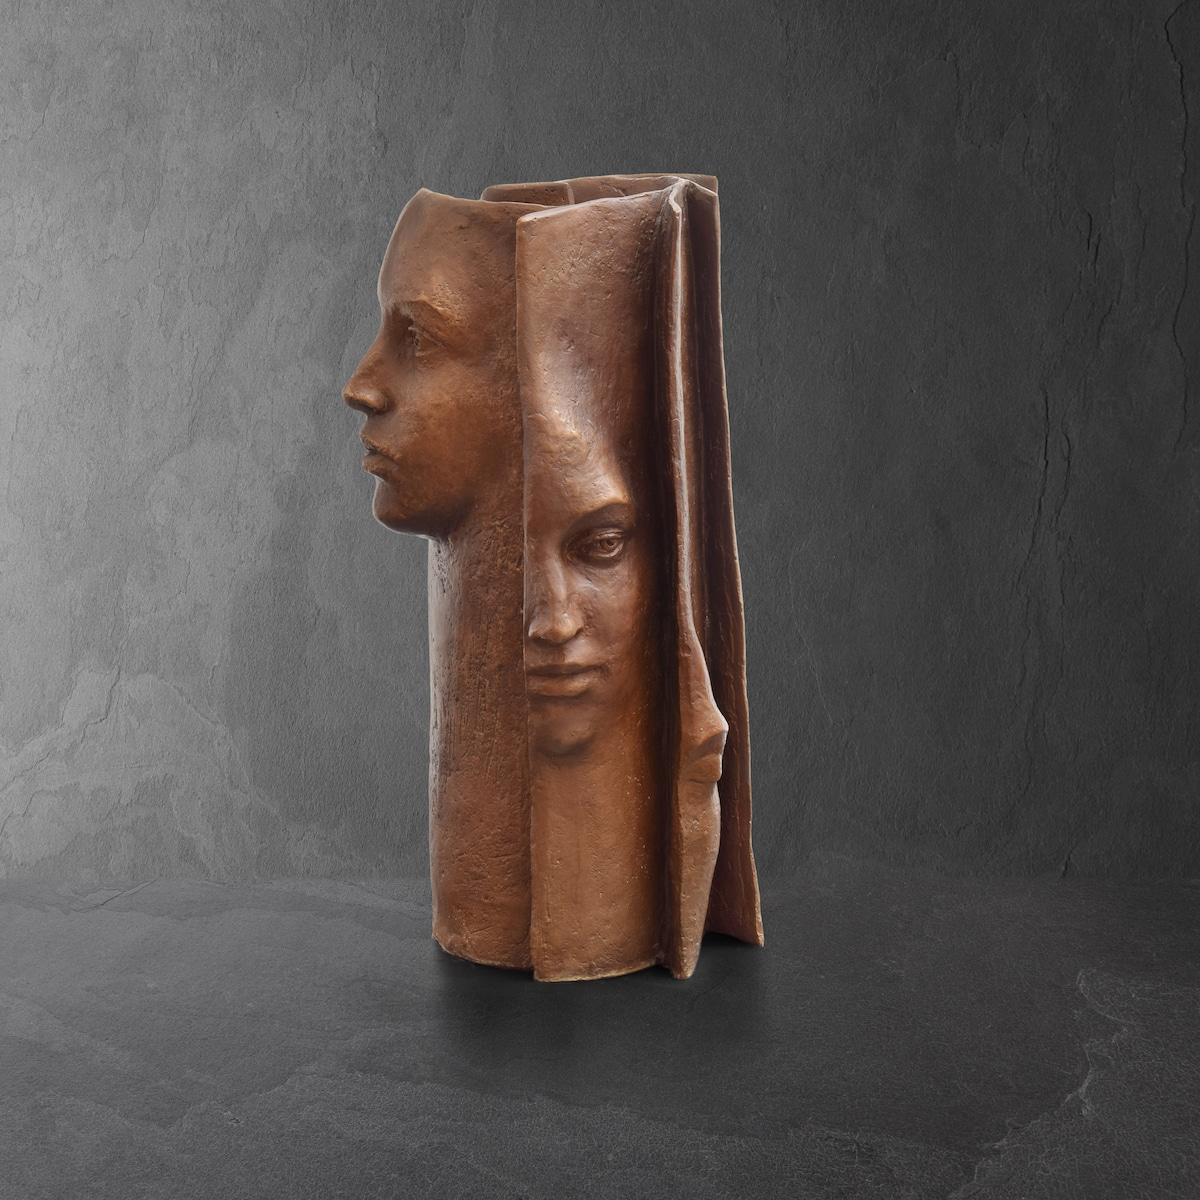 Paola Grizi escultura en bronce